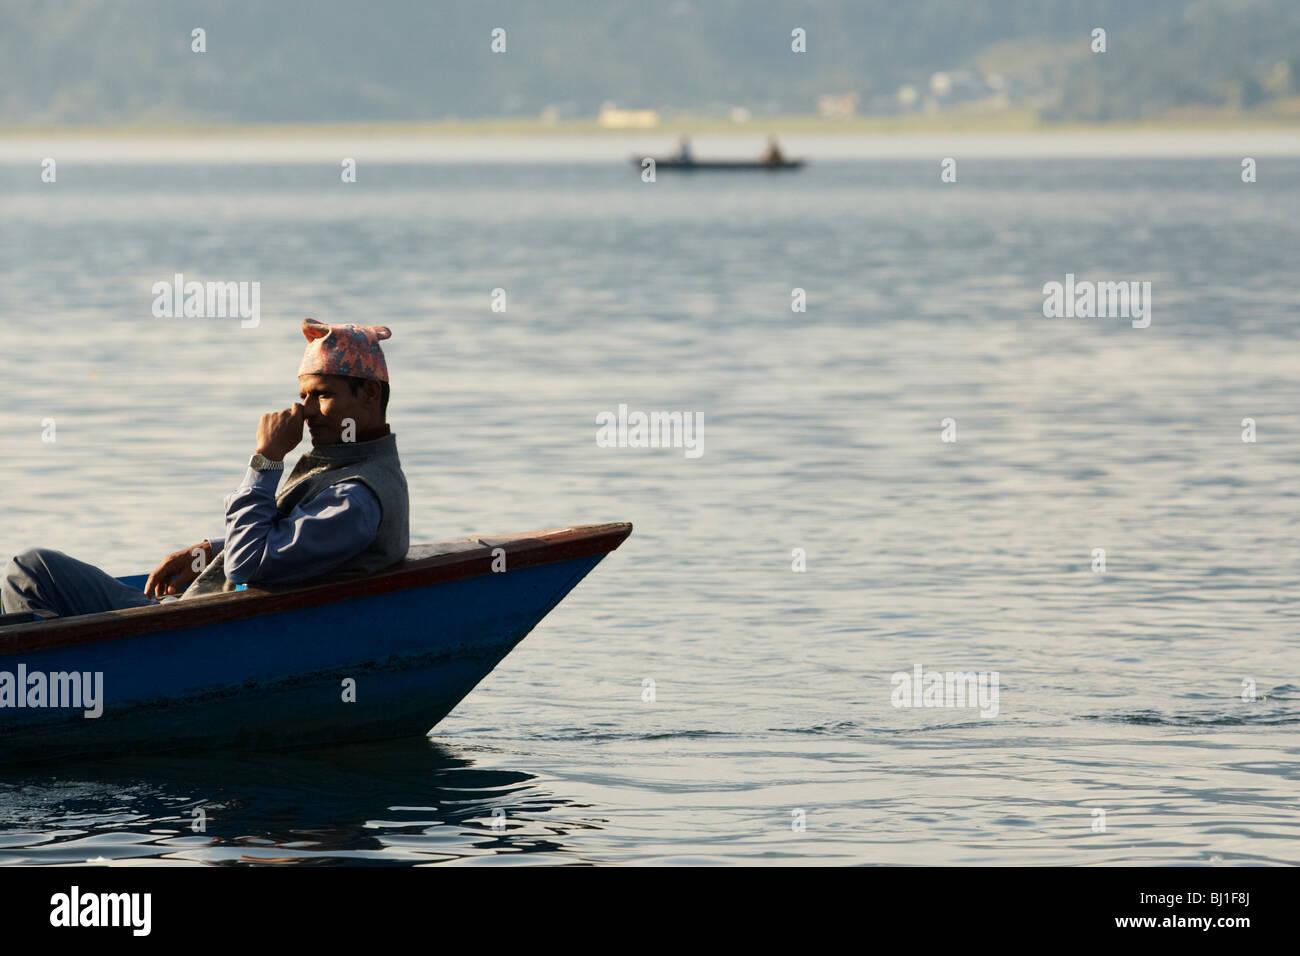 Man sitting in a canoe on Pewha Lake in Pokhara, Nepal on Monday October 26, 2009. - Stock Image